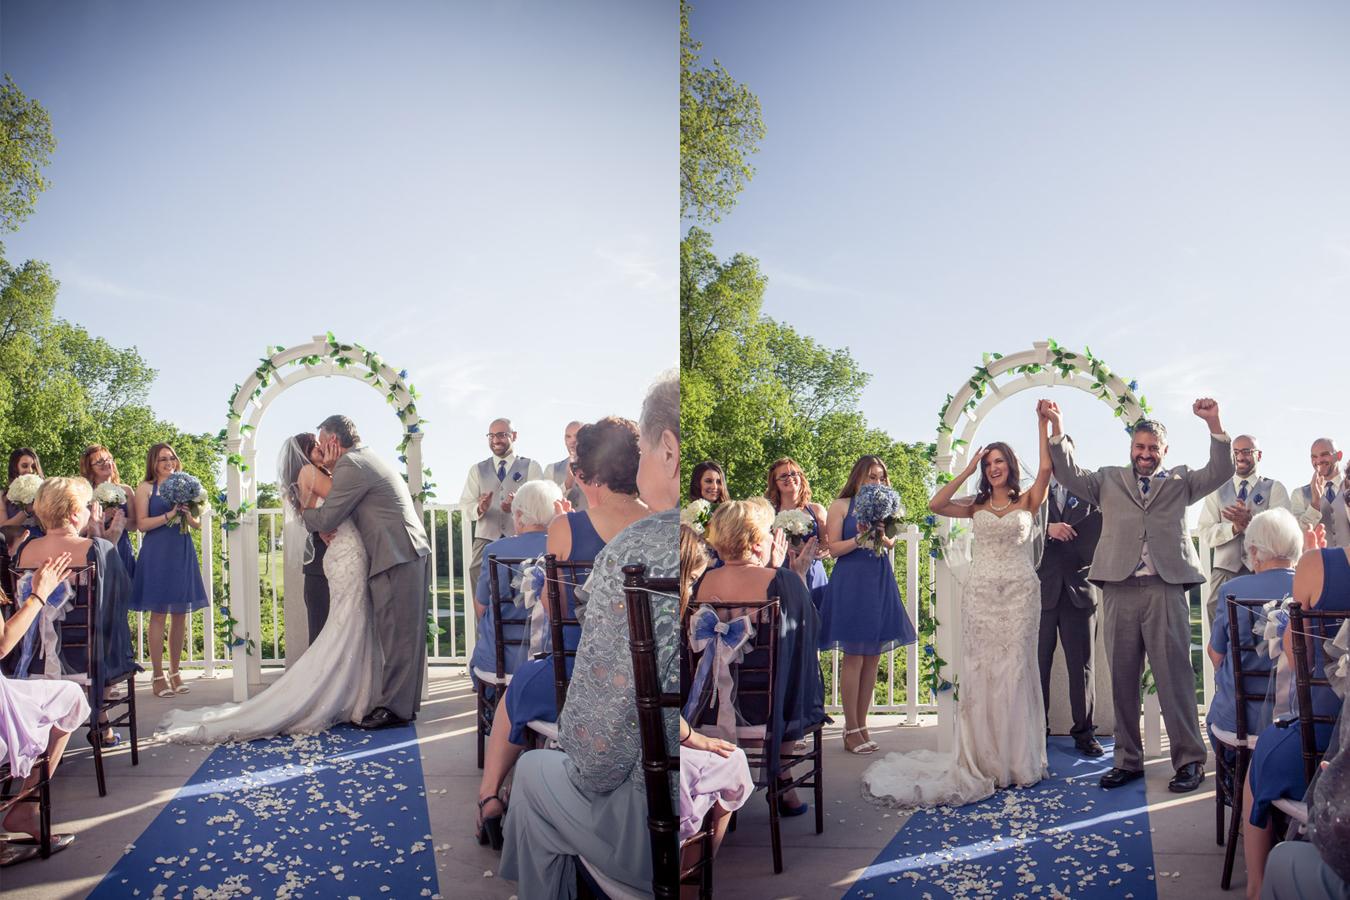 NEPA_Pocono_Weddings_Rob_Lettieri_Photography_11.jpg